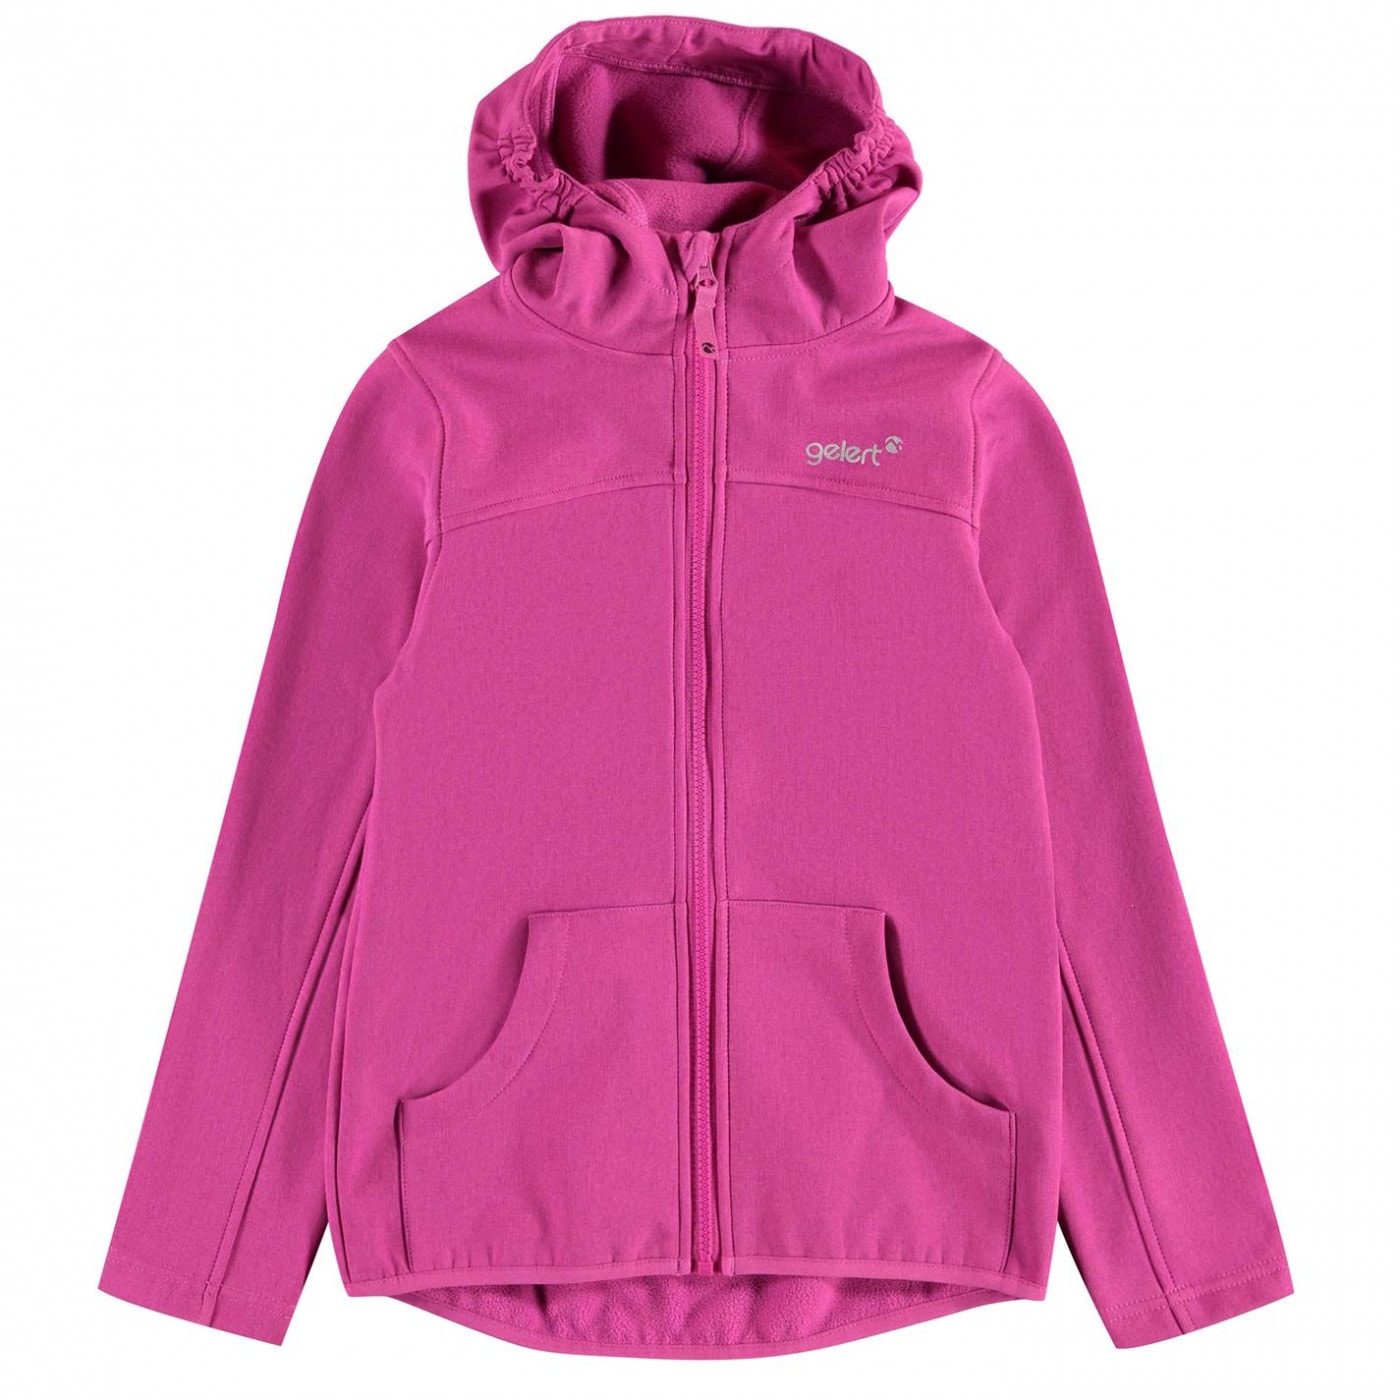 Gelert Softshell Hooded Jacket Unisex Junior